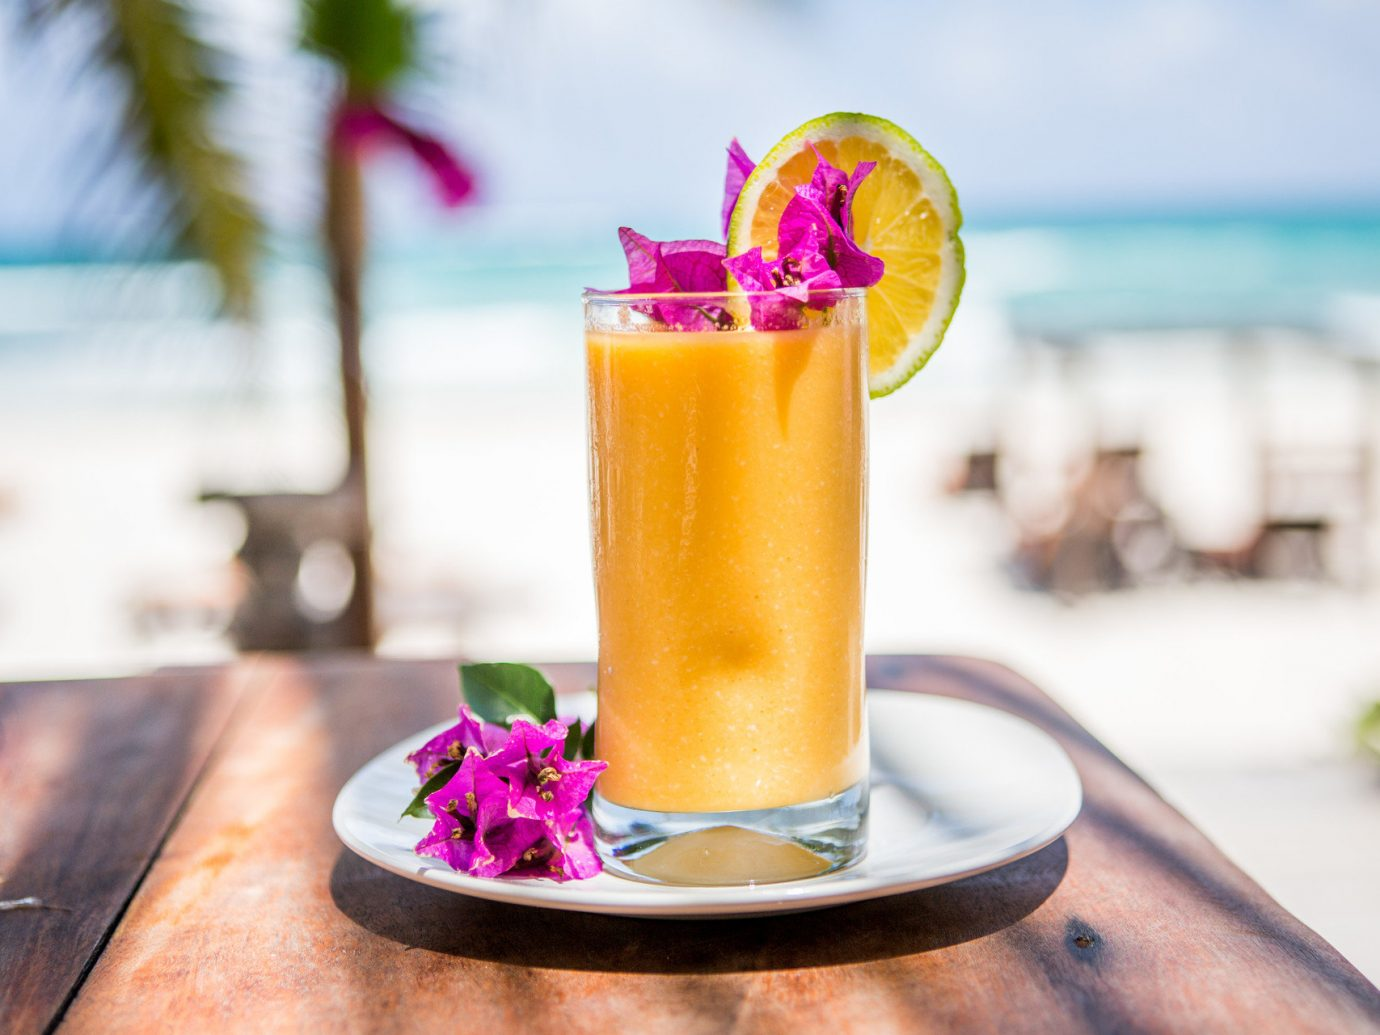 Trip Ideas table cup Drink food cocktail alcoholic beverage produce mai tai juice distilled beverage brunch smoothie flavor fruit beverage close